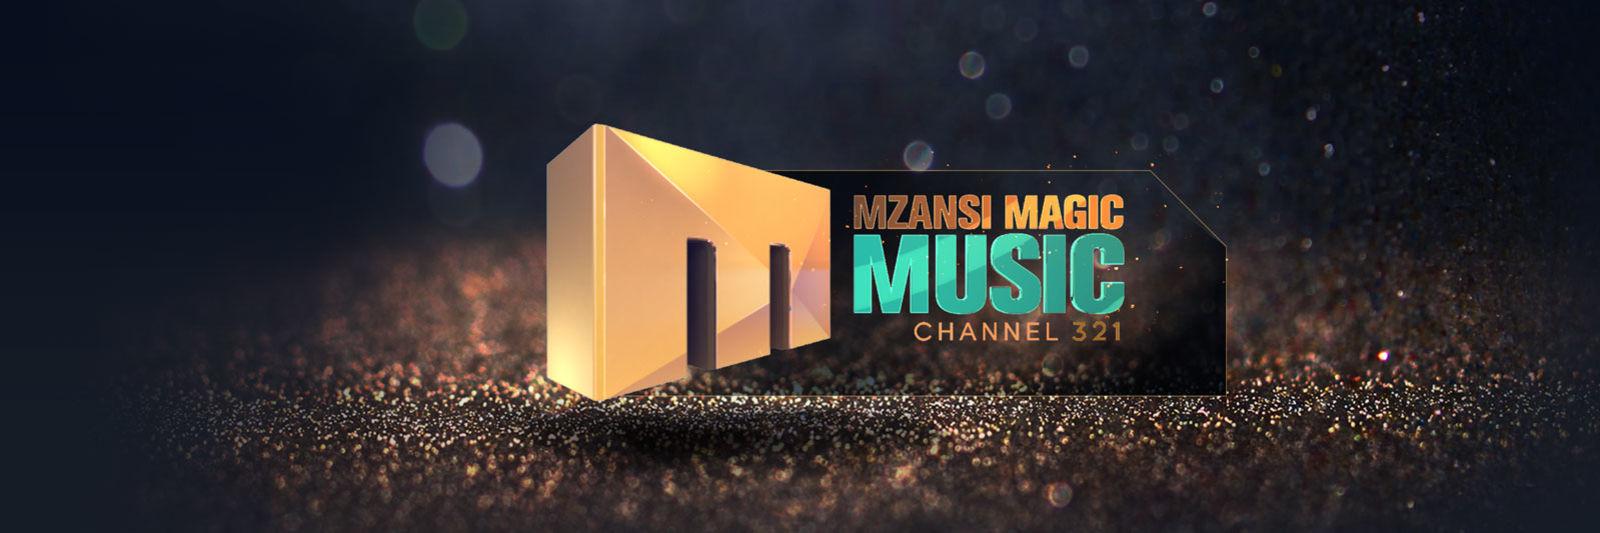 27 mzansi magic music 1600x533 004 pre